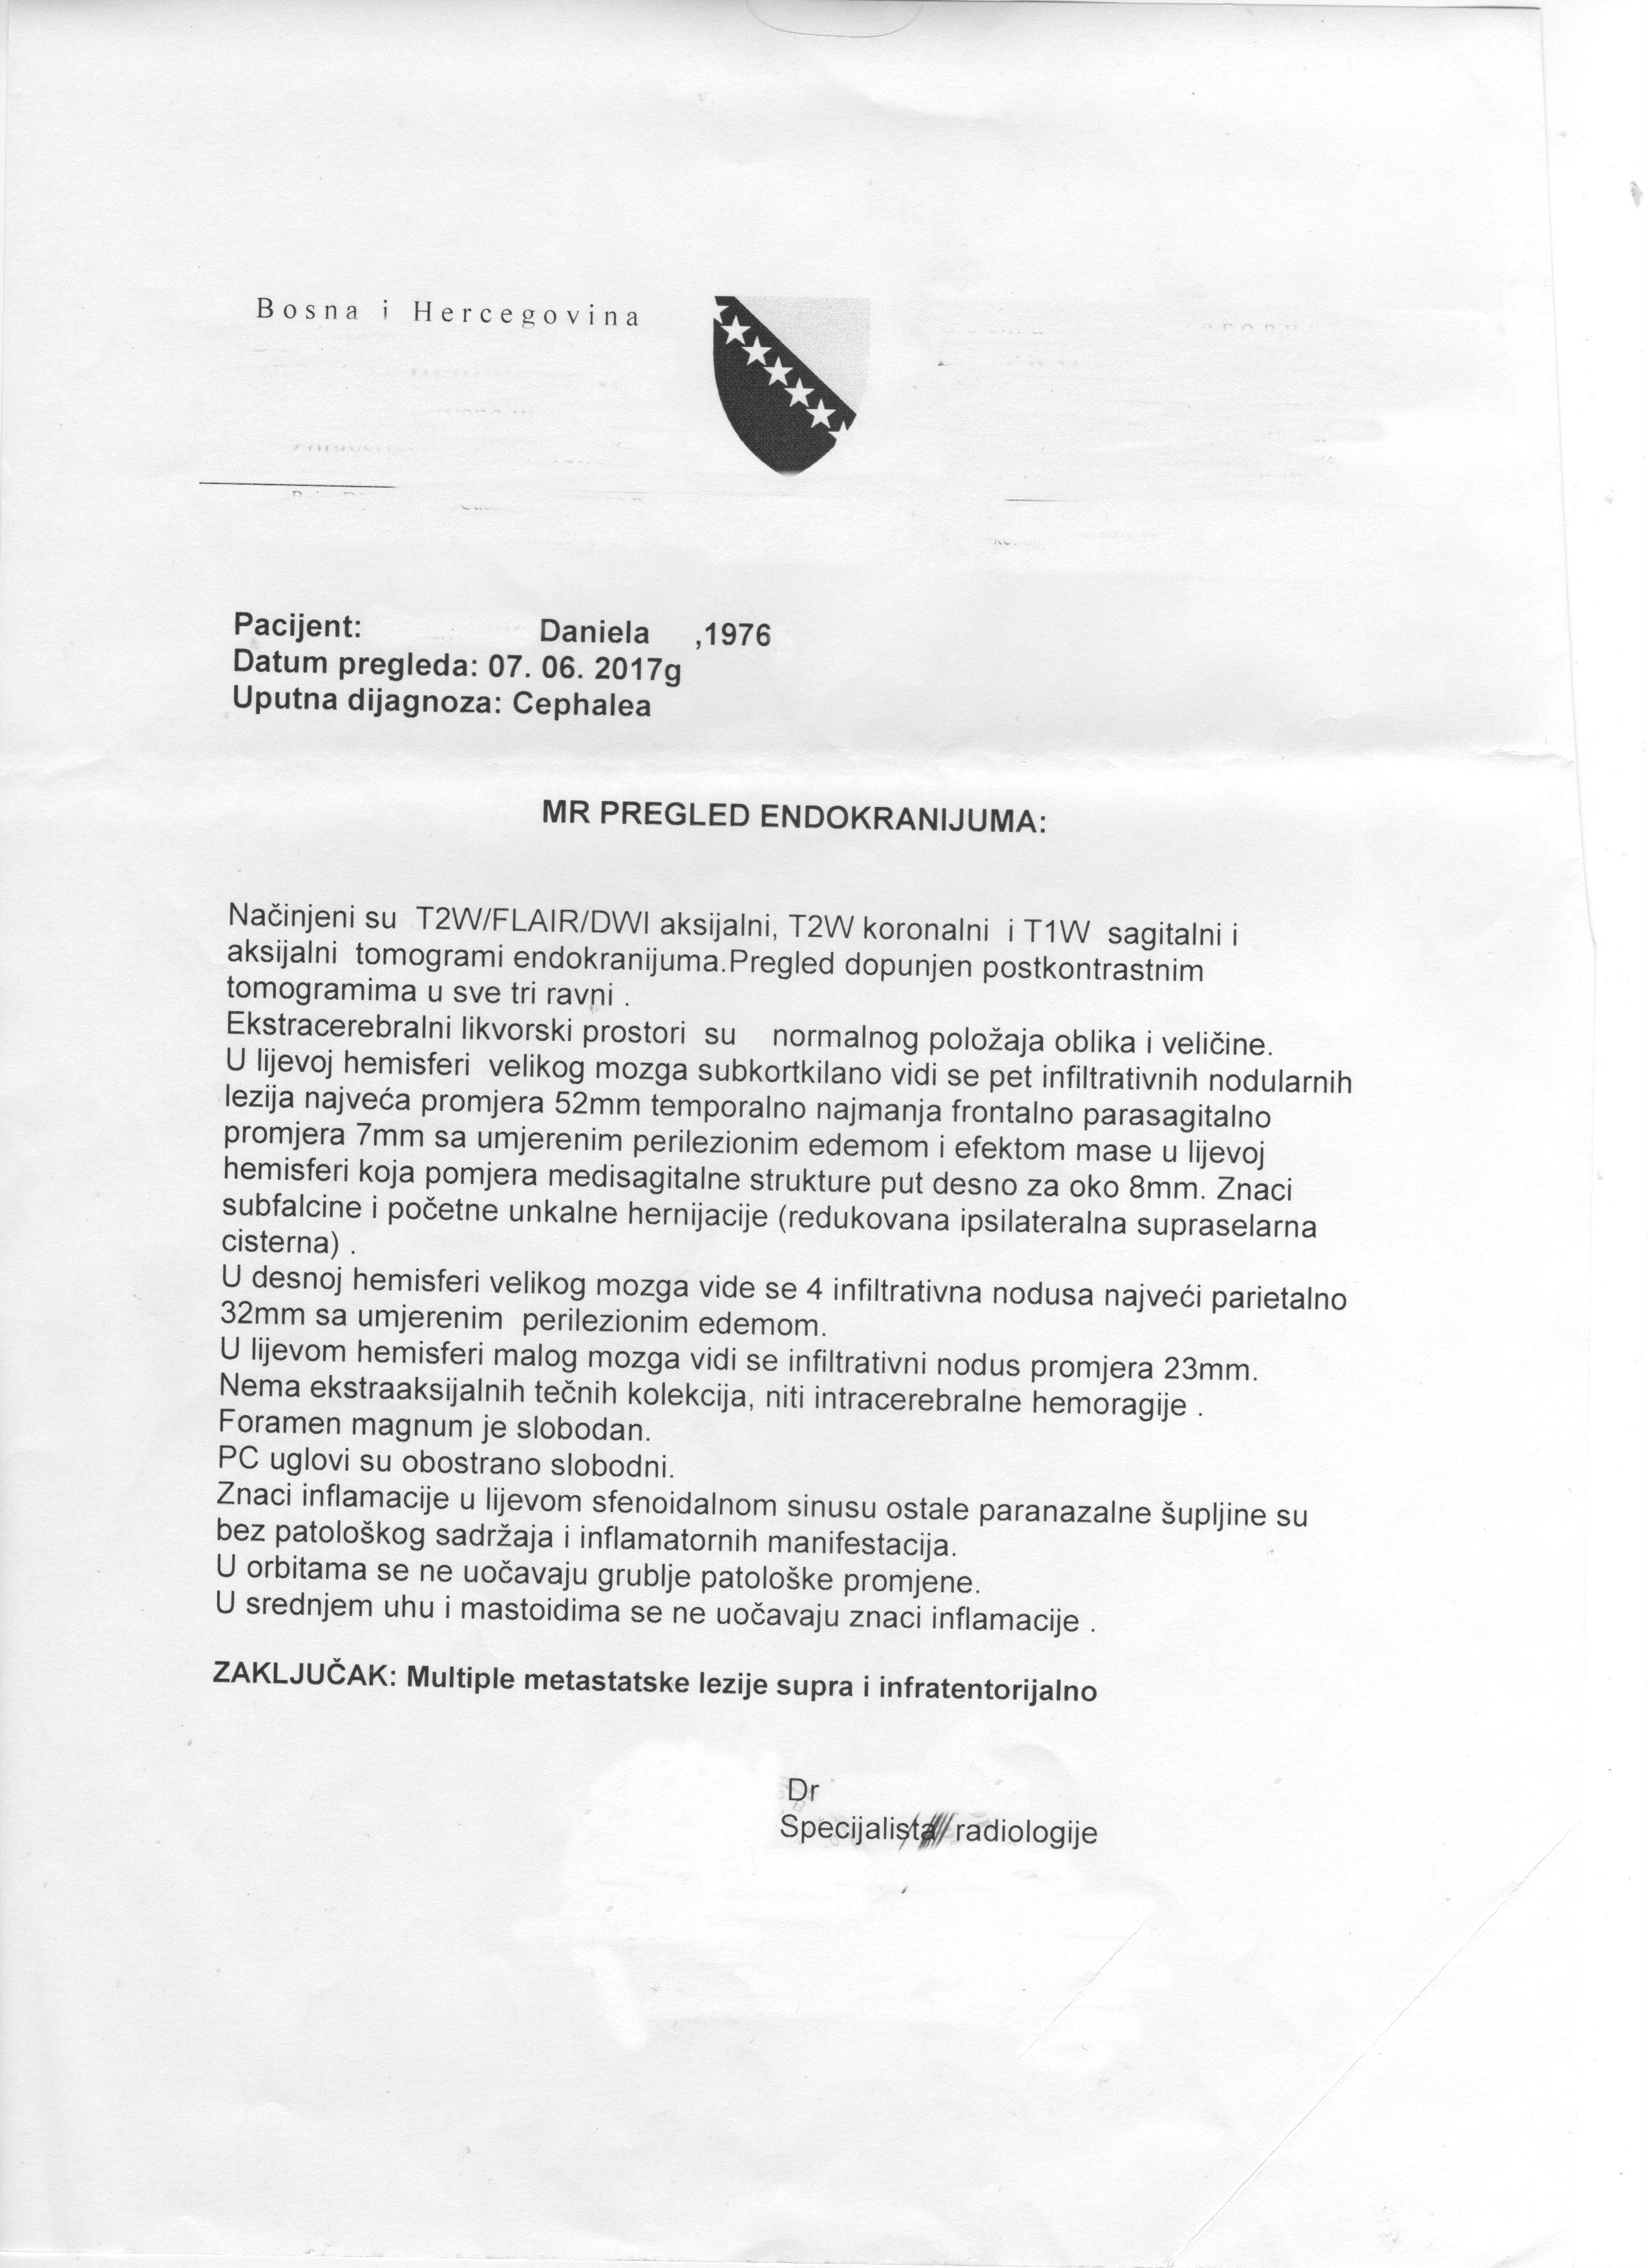 LifEscozul® - Daniela 3 - Melanoma